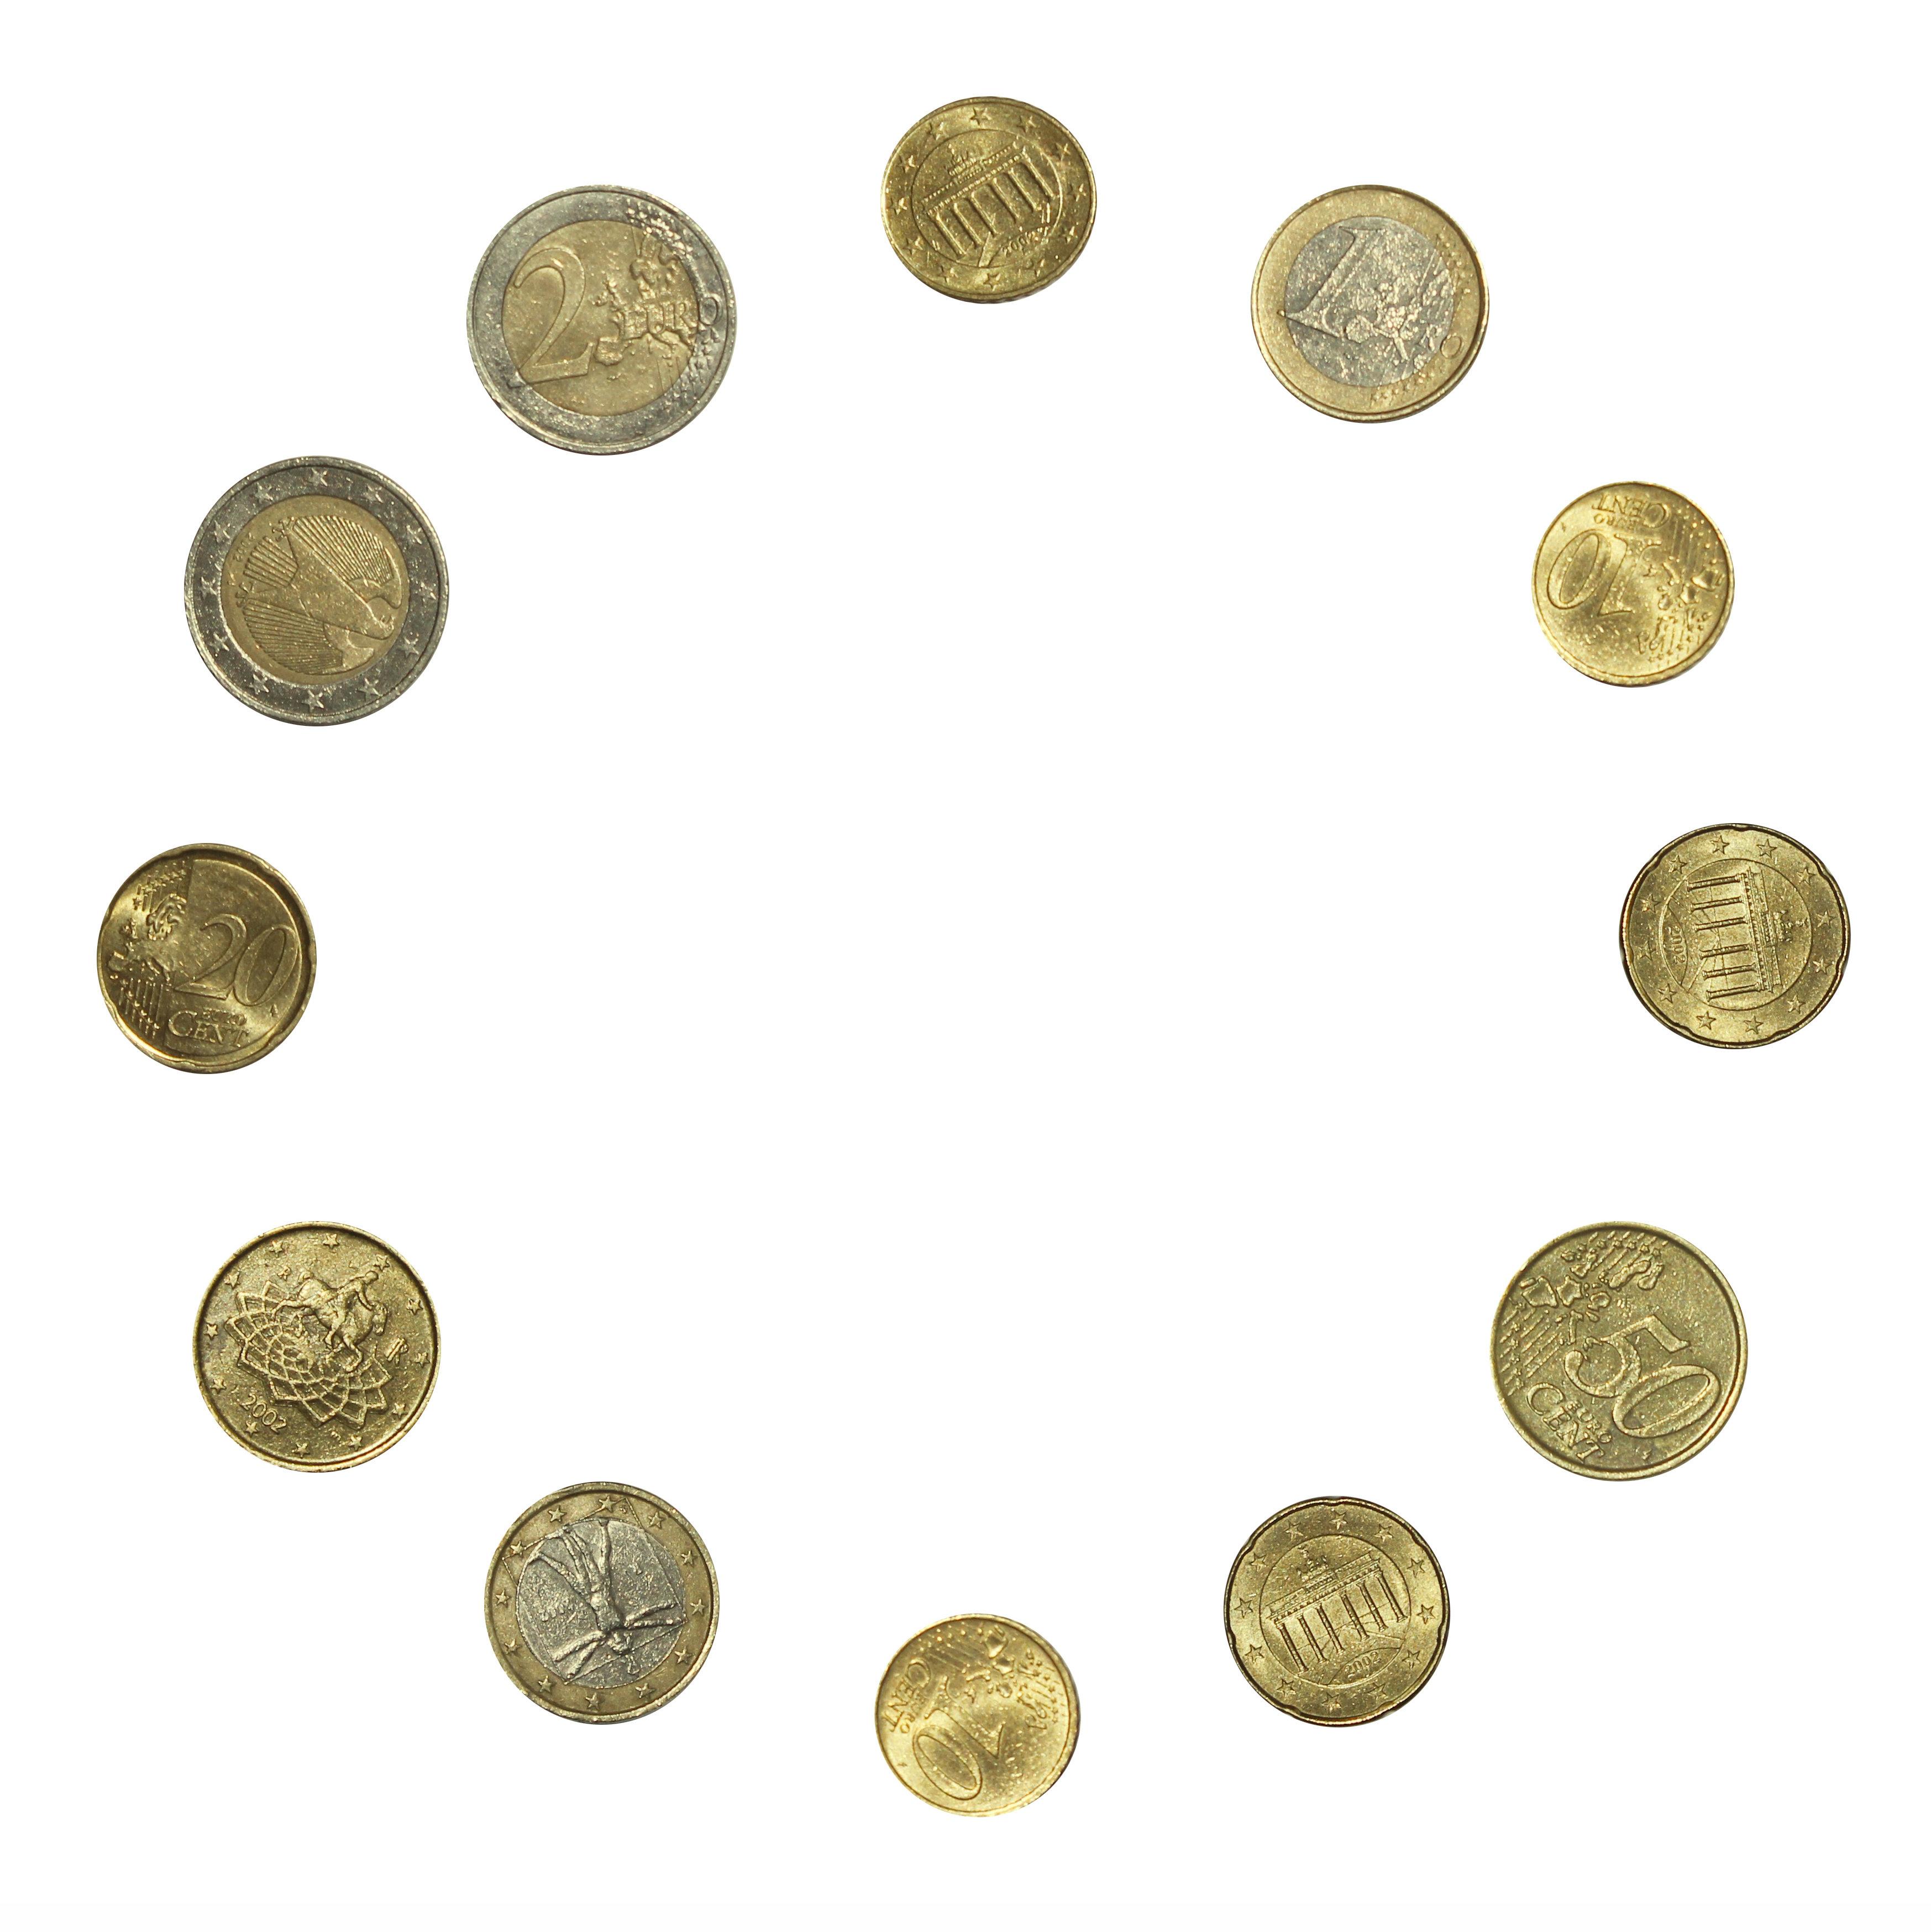 EU Steuerpolitik